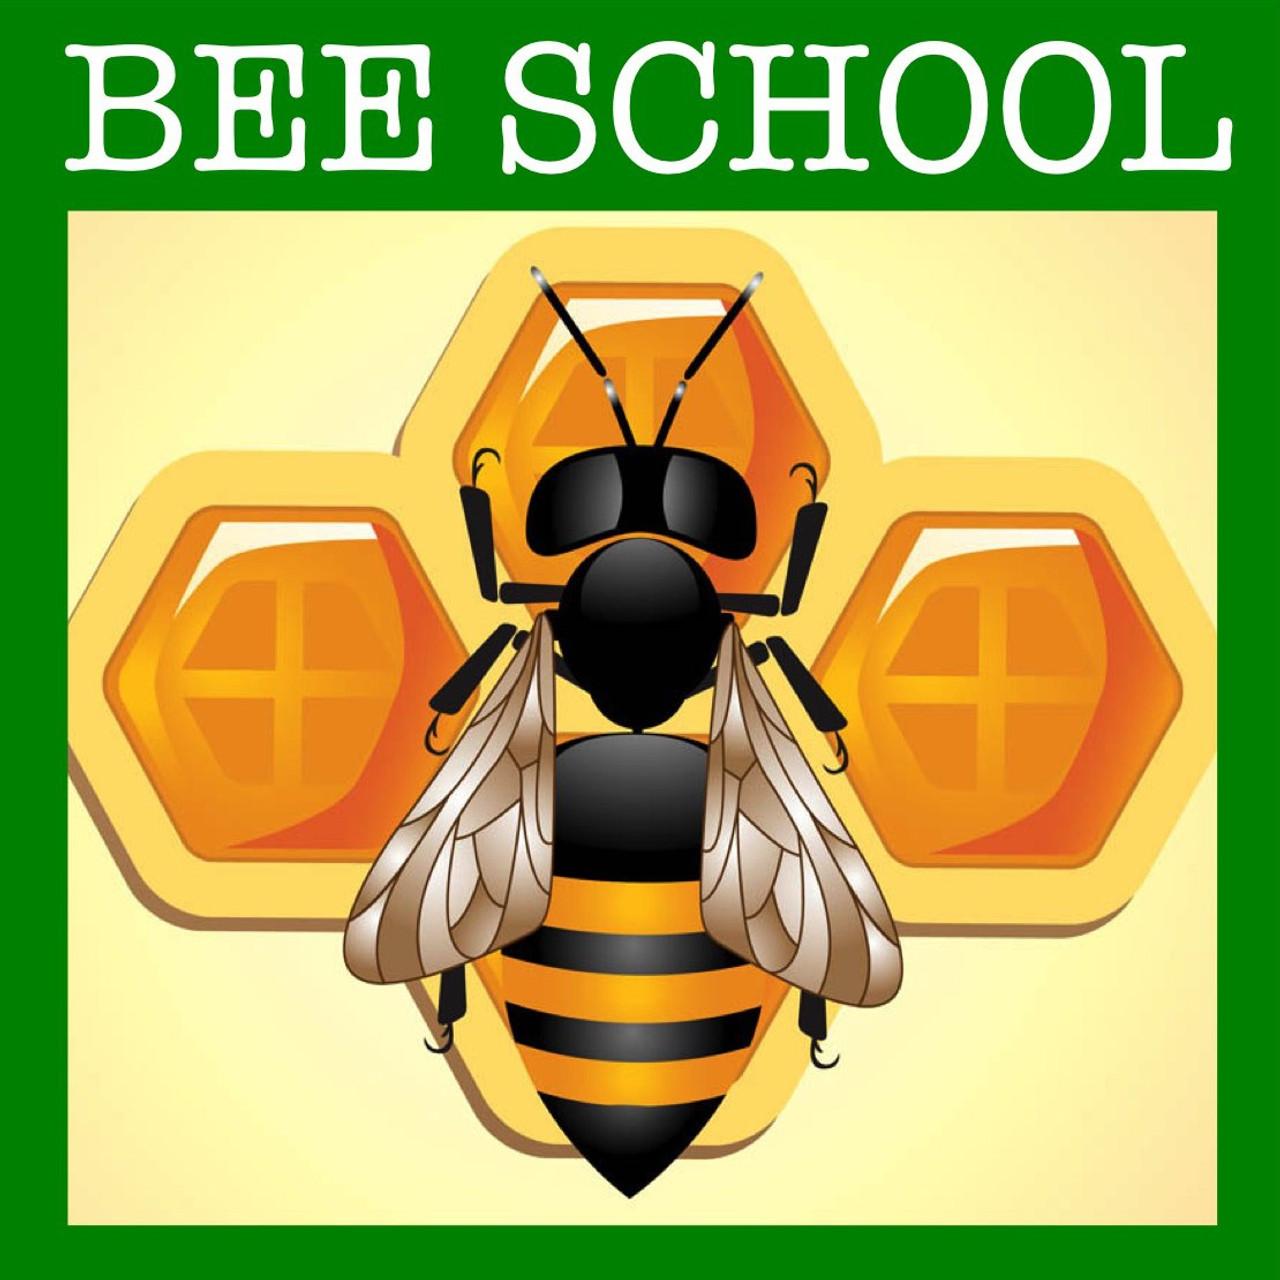 Top Bar Beekeeping Class: Burnsville, NC - March 9 and 10, 2019